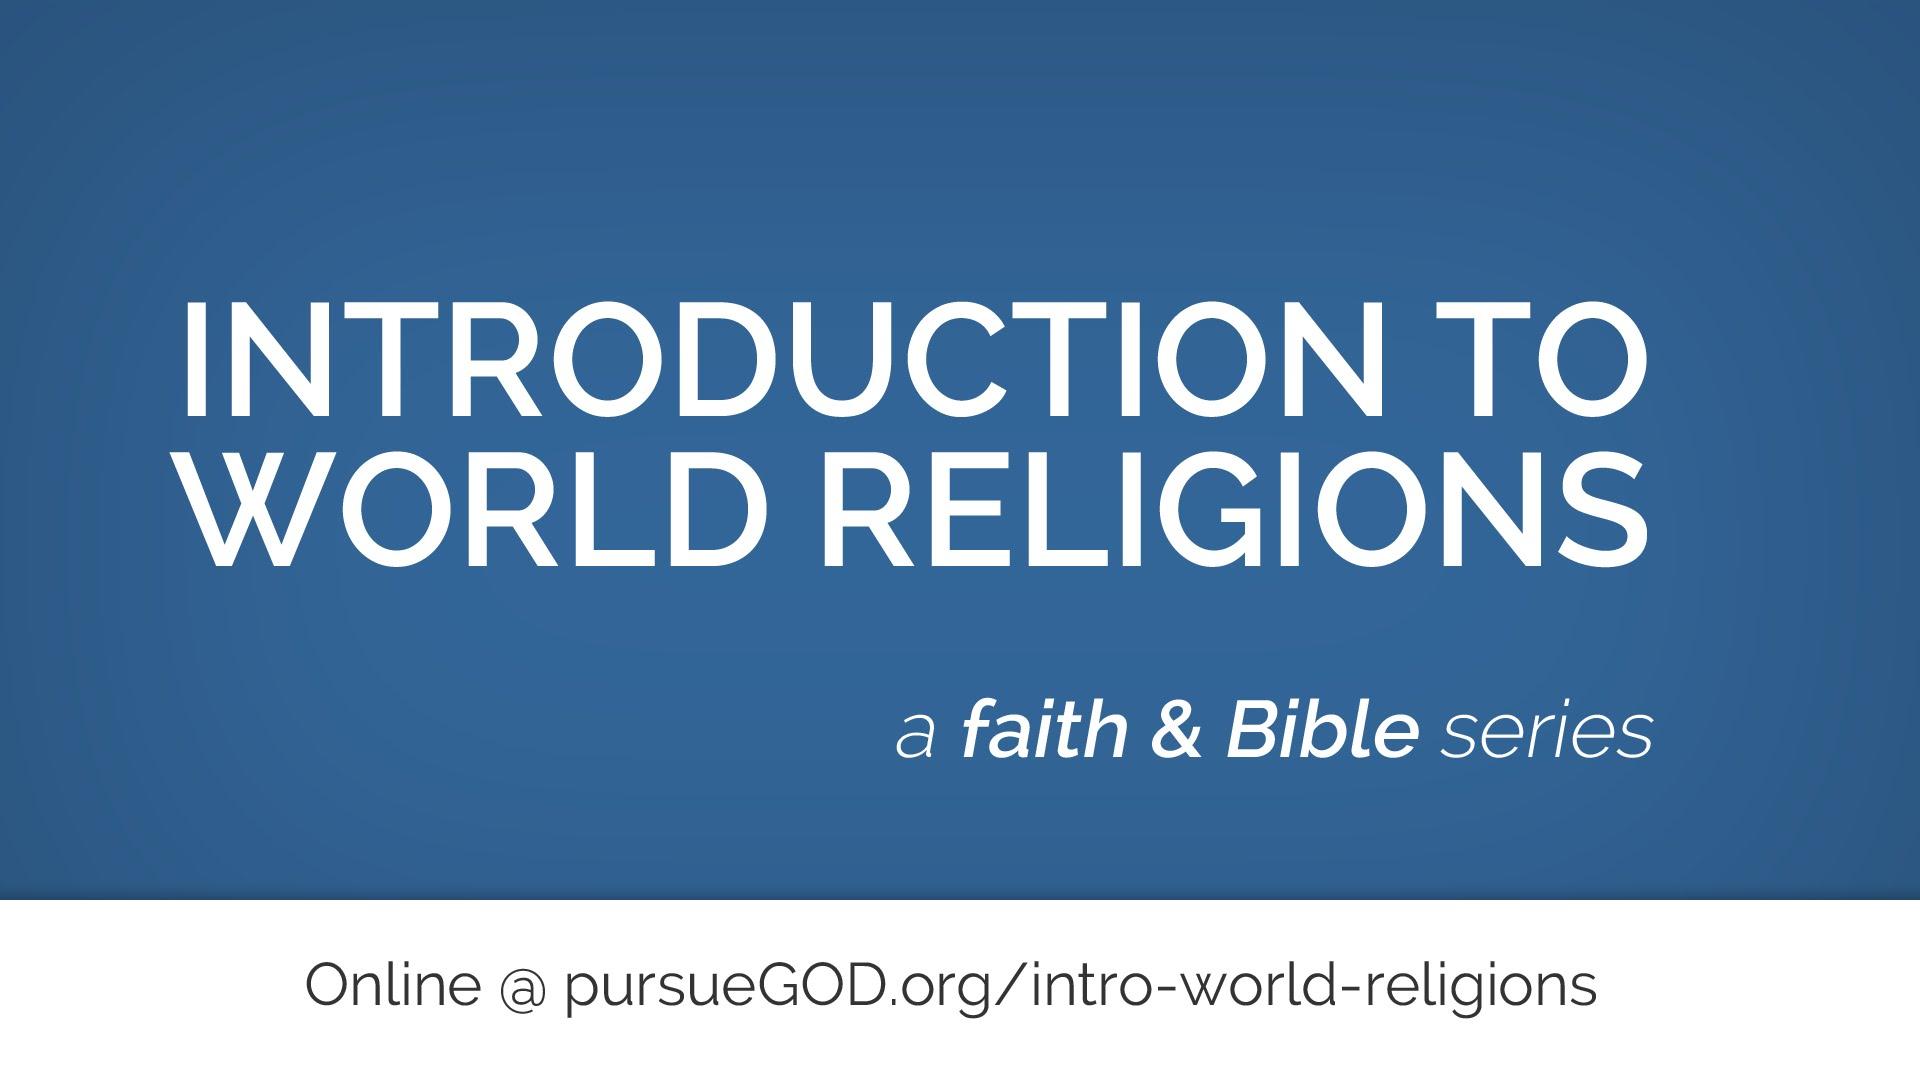 Intro to World Religions (Series)